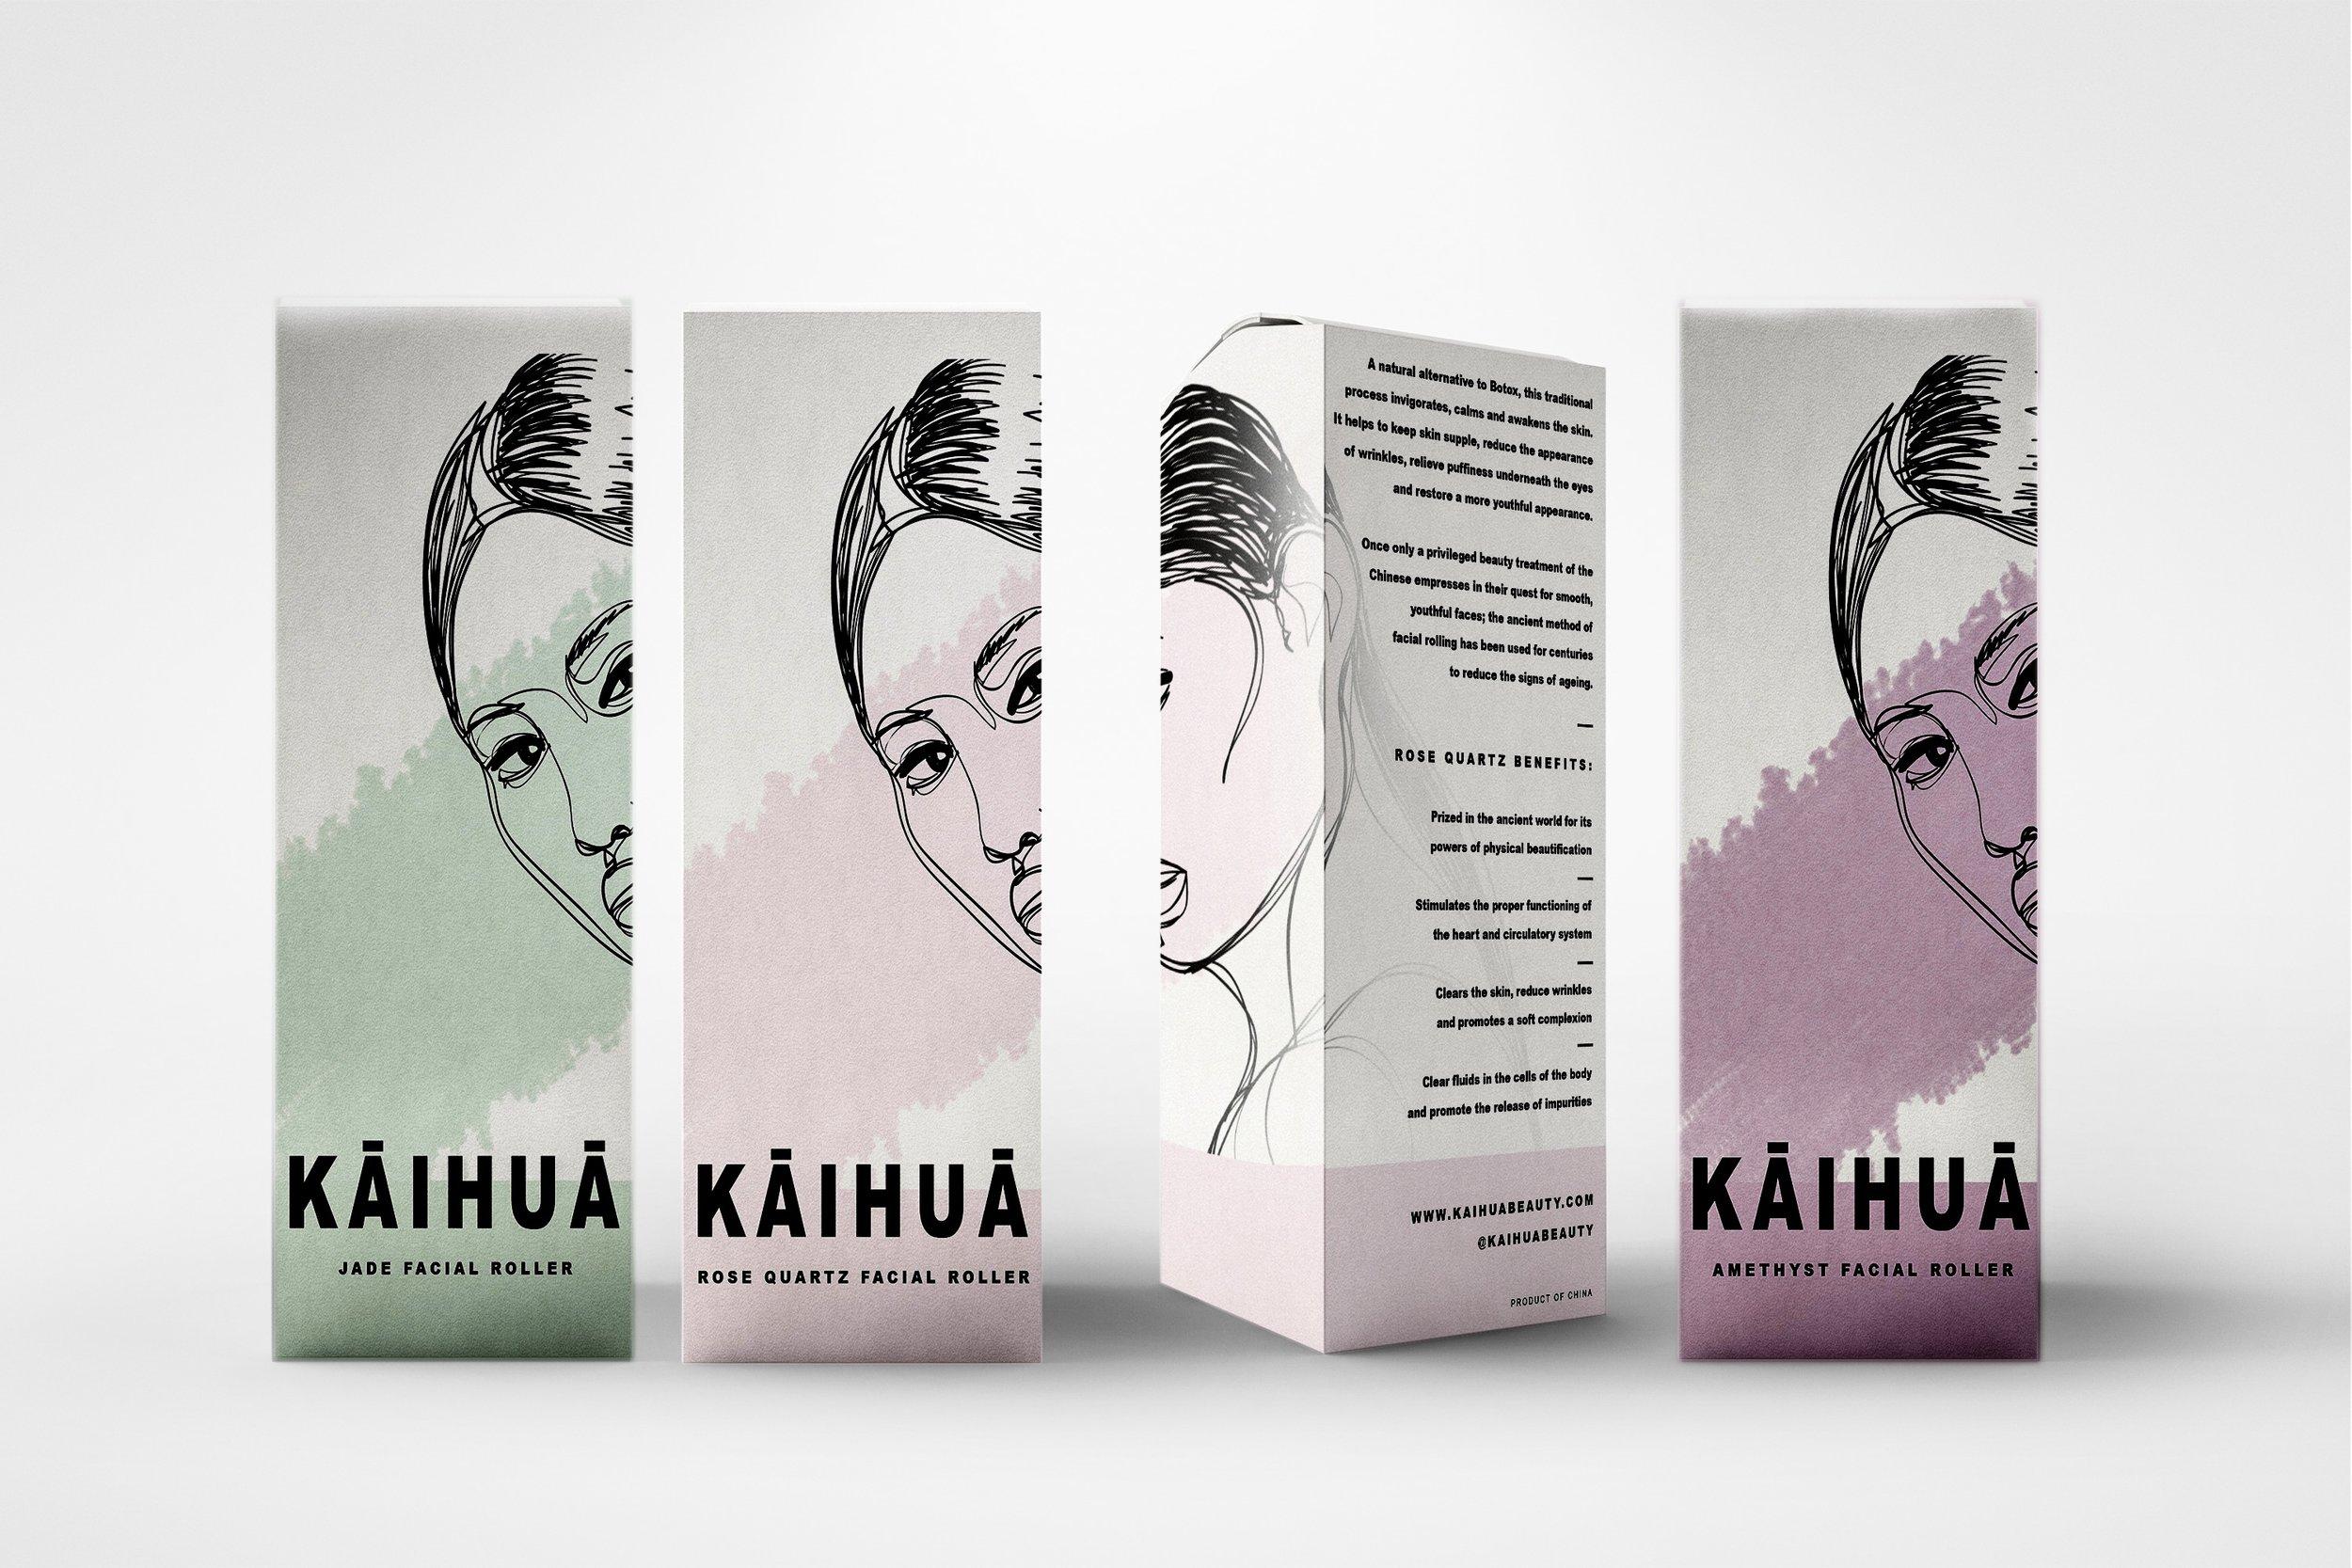 Kaihua // Packaging design // Sydney, Australia